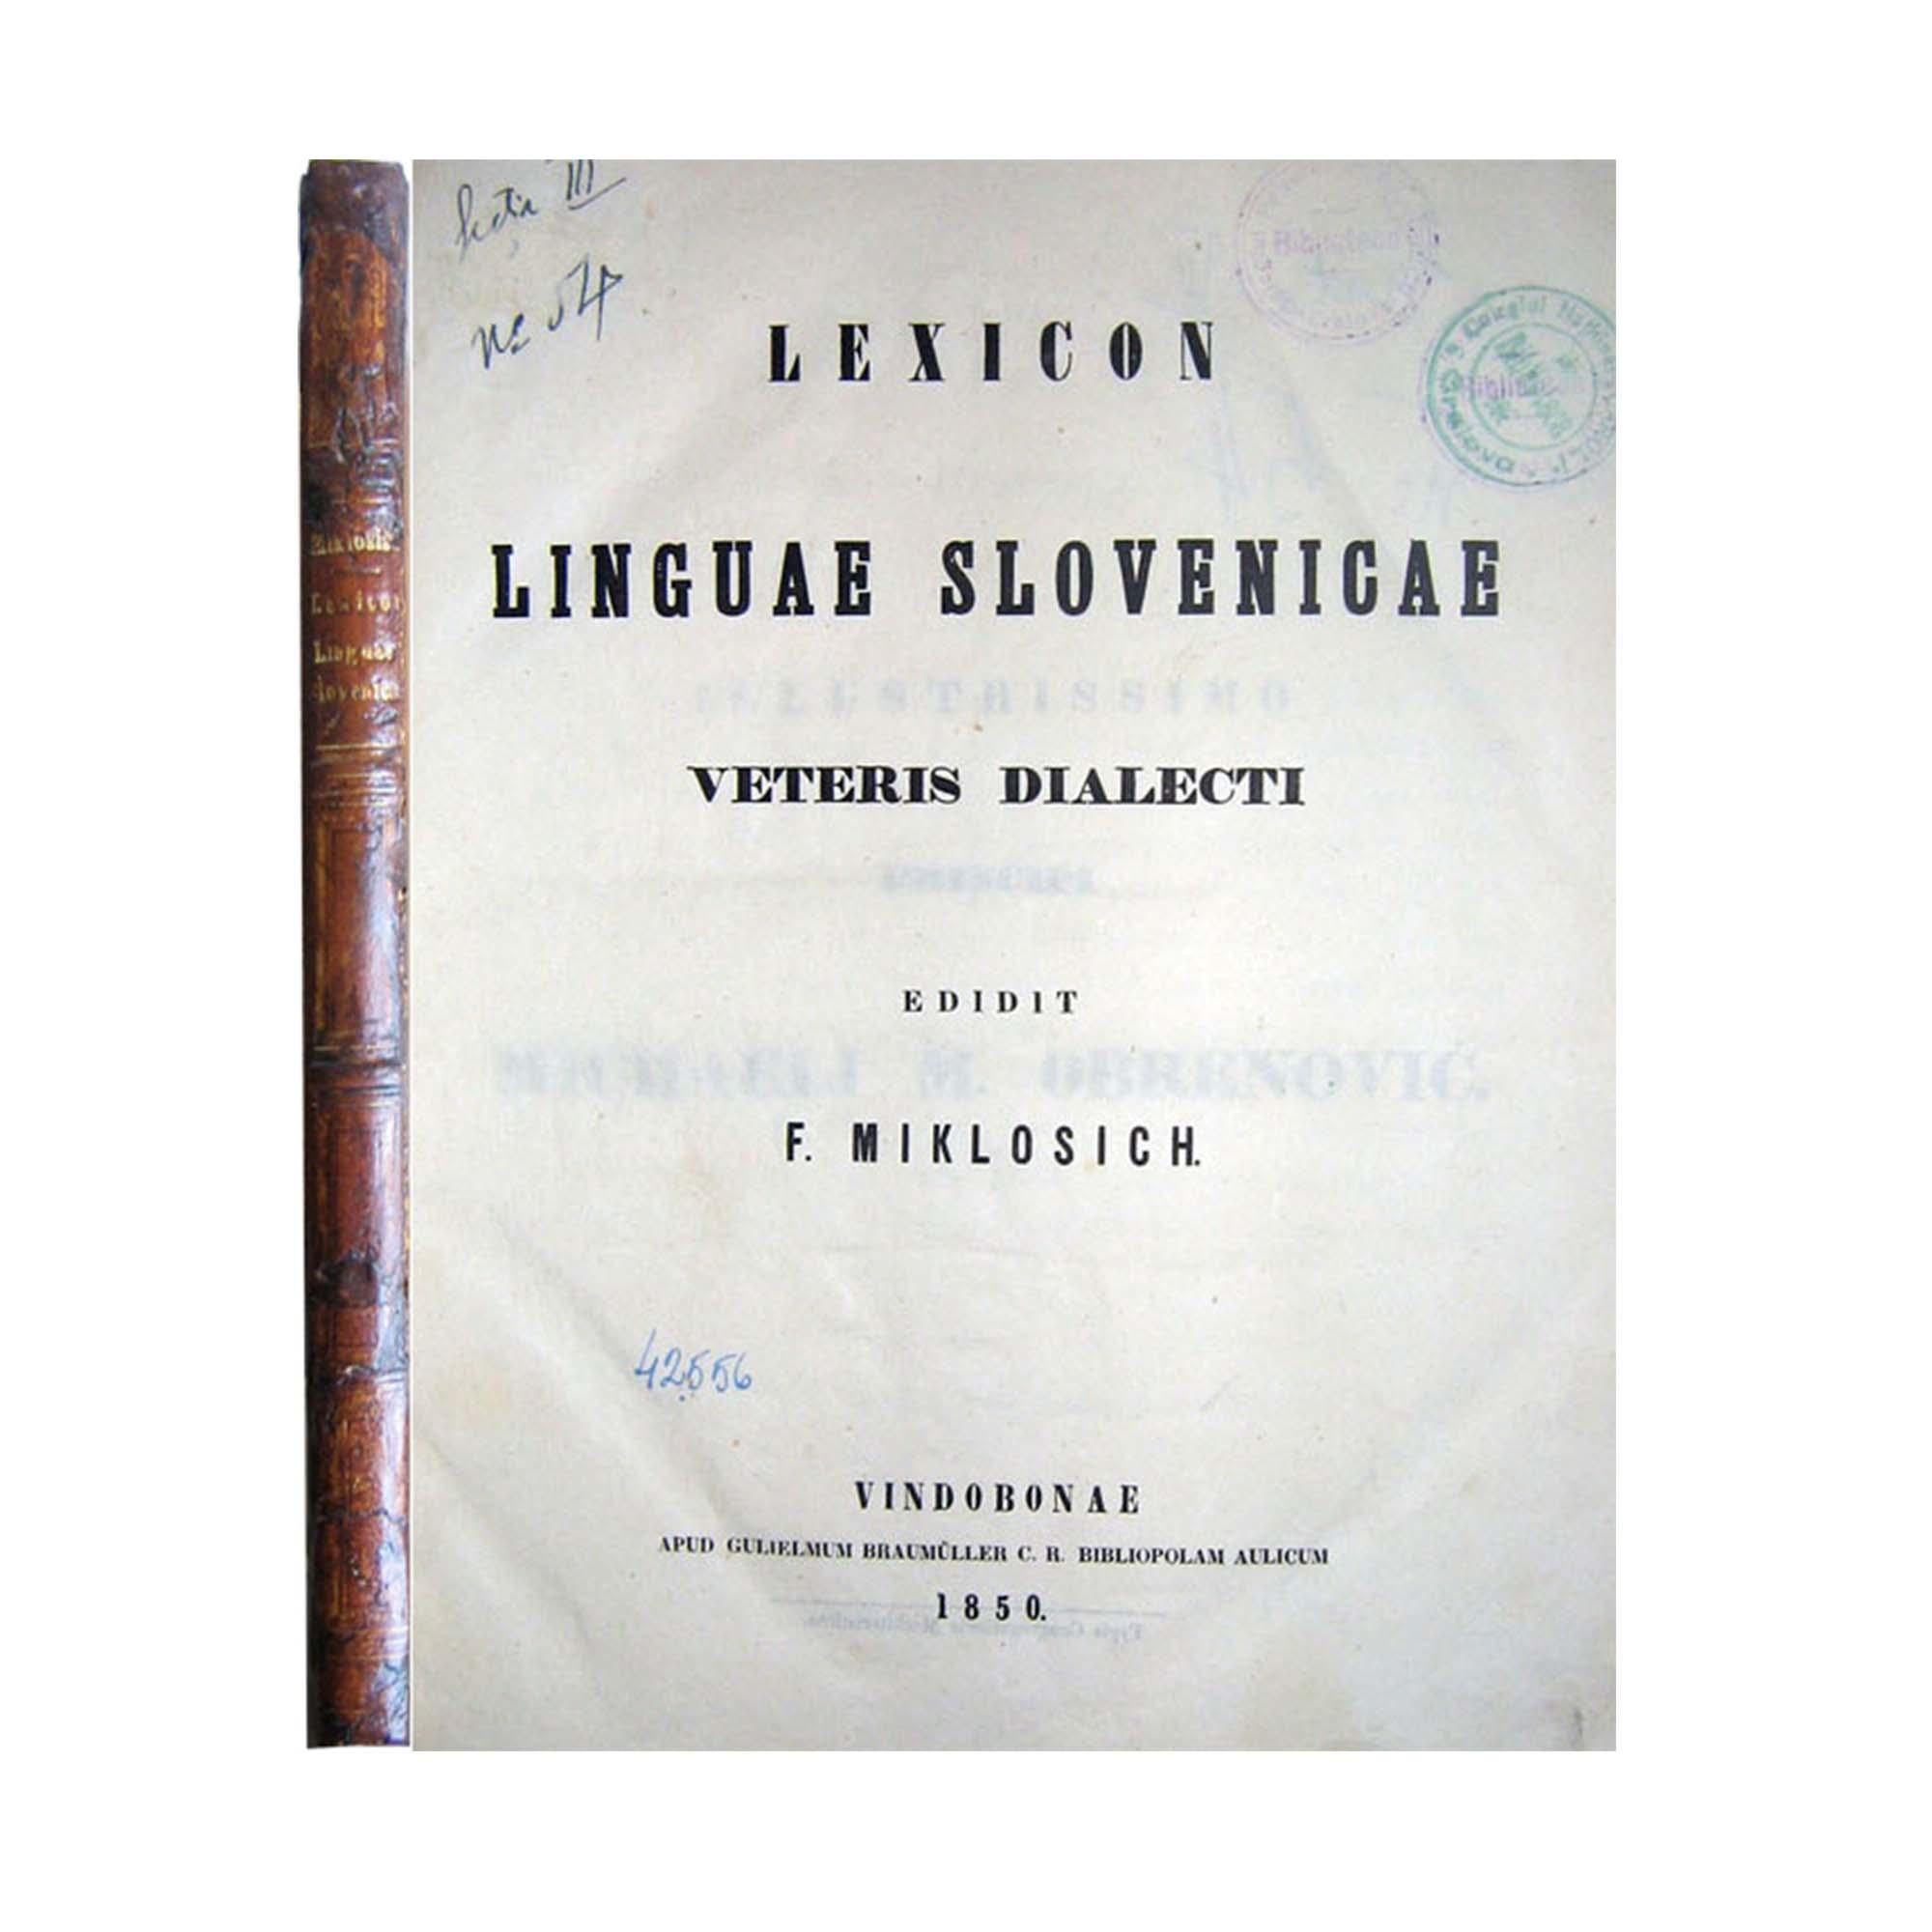 1011-Miklosich-Lexicon-slovenicae-1850-N.jpg